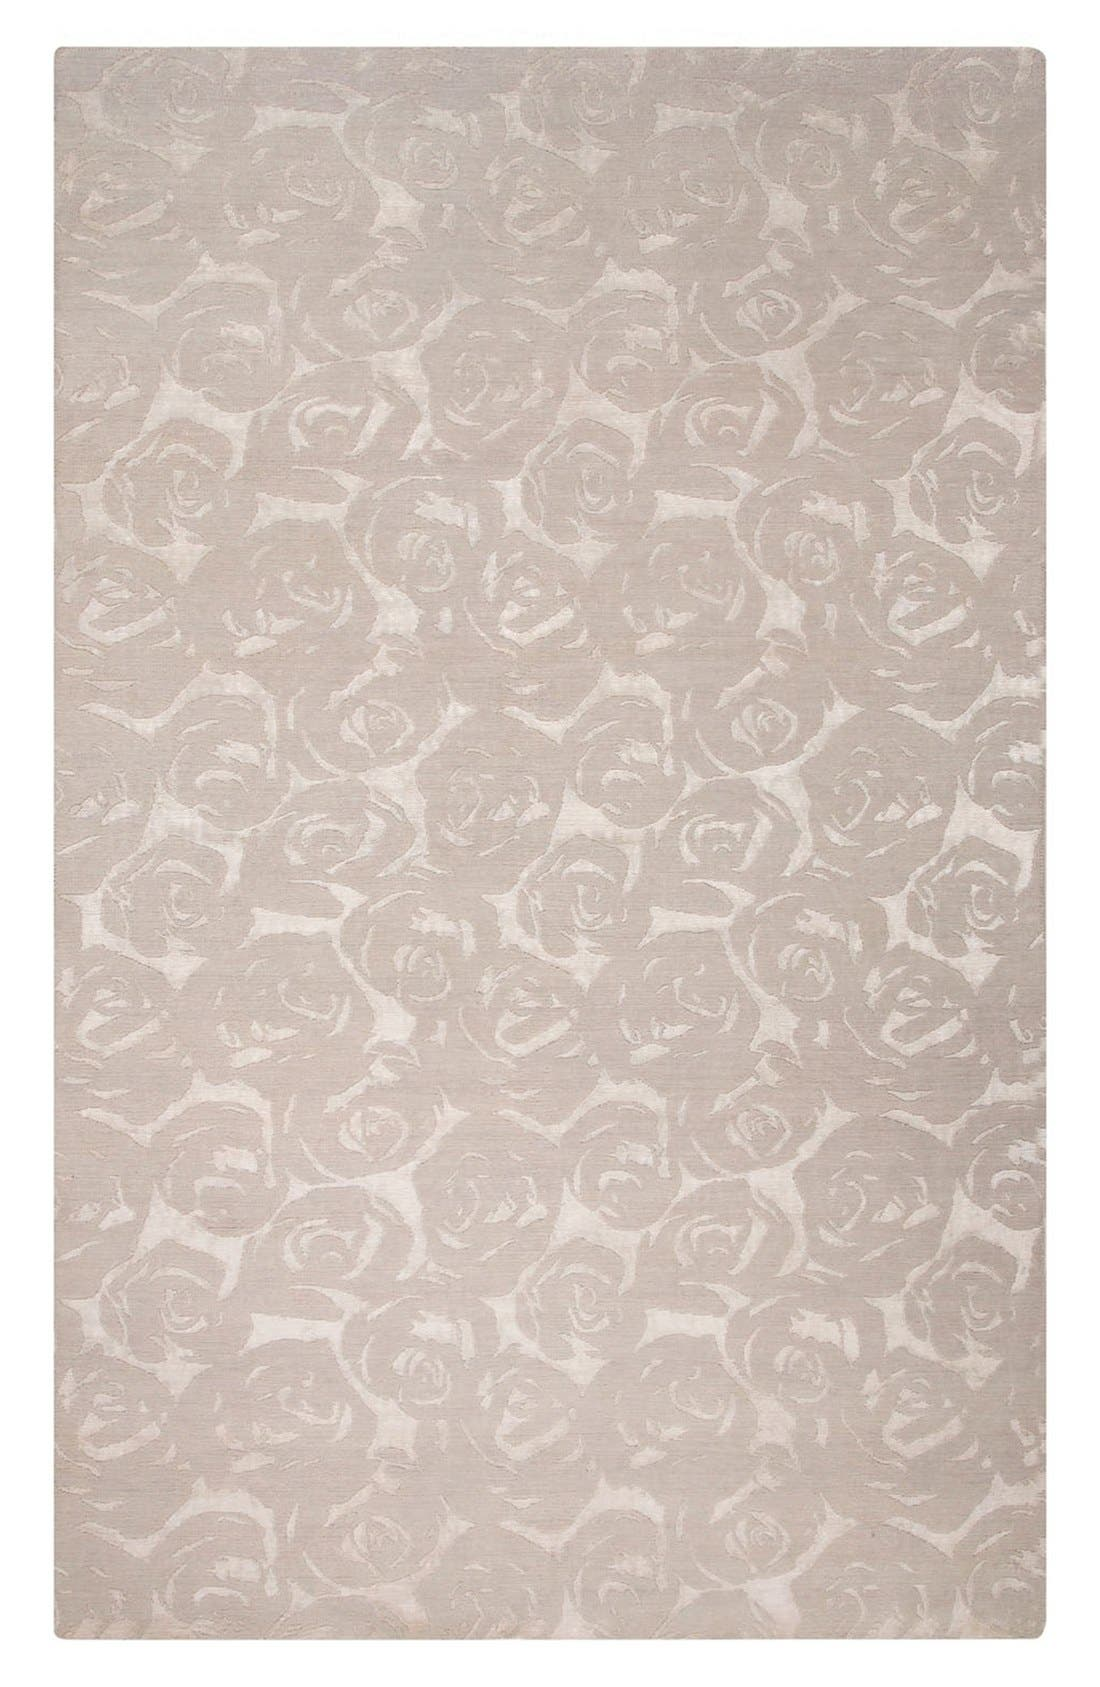 Alternate Image 1 Selected - kate spade new york 'noho' premium wool blend rug